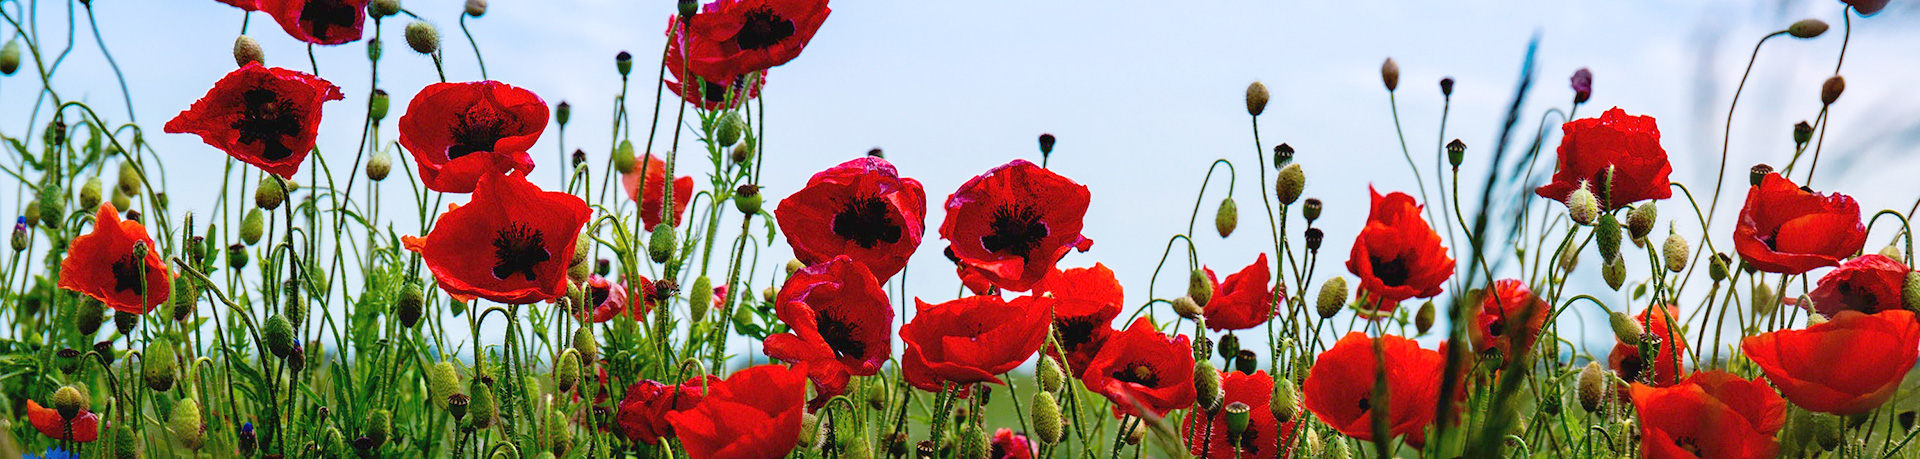 Rote Blumenwiese